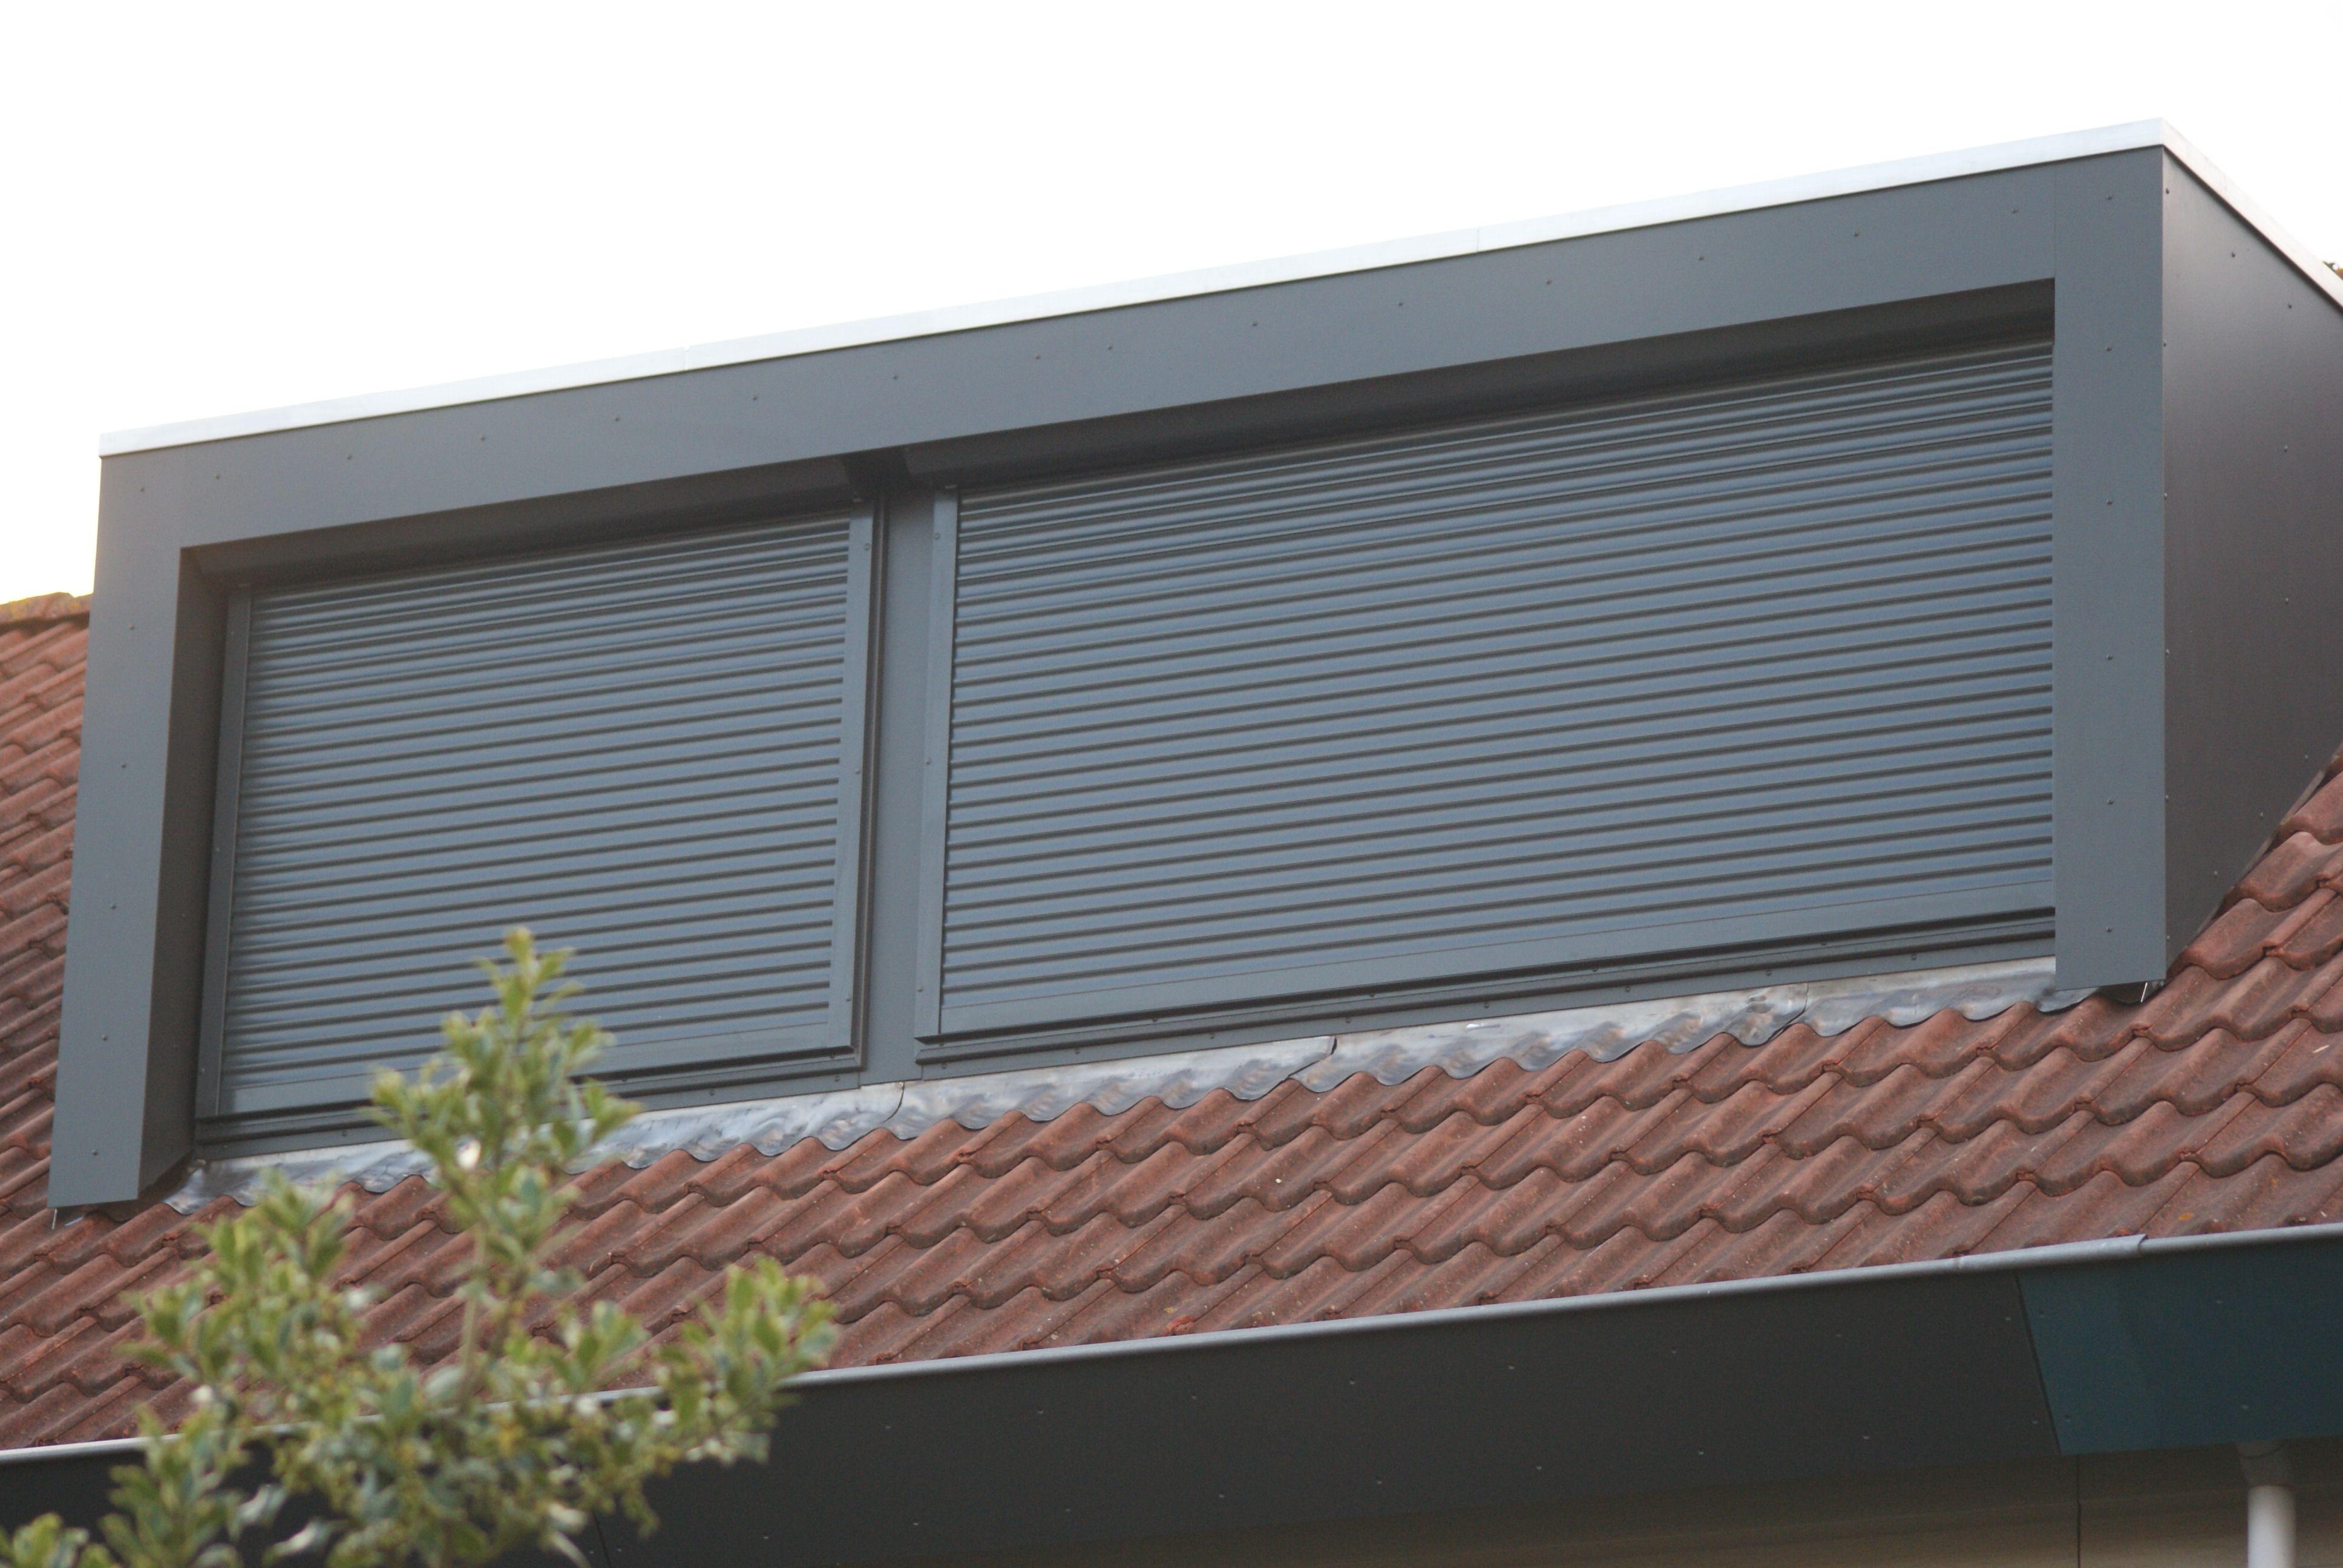 Dakkapel buitenkant met rolluik details house loft spaces